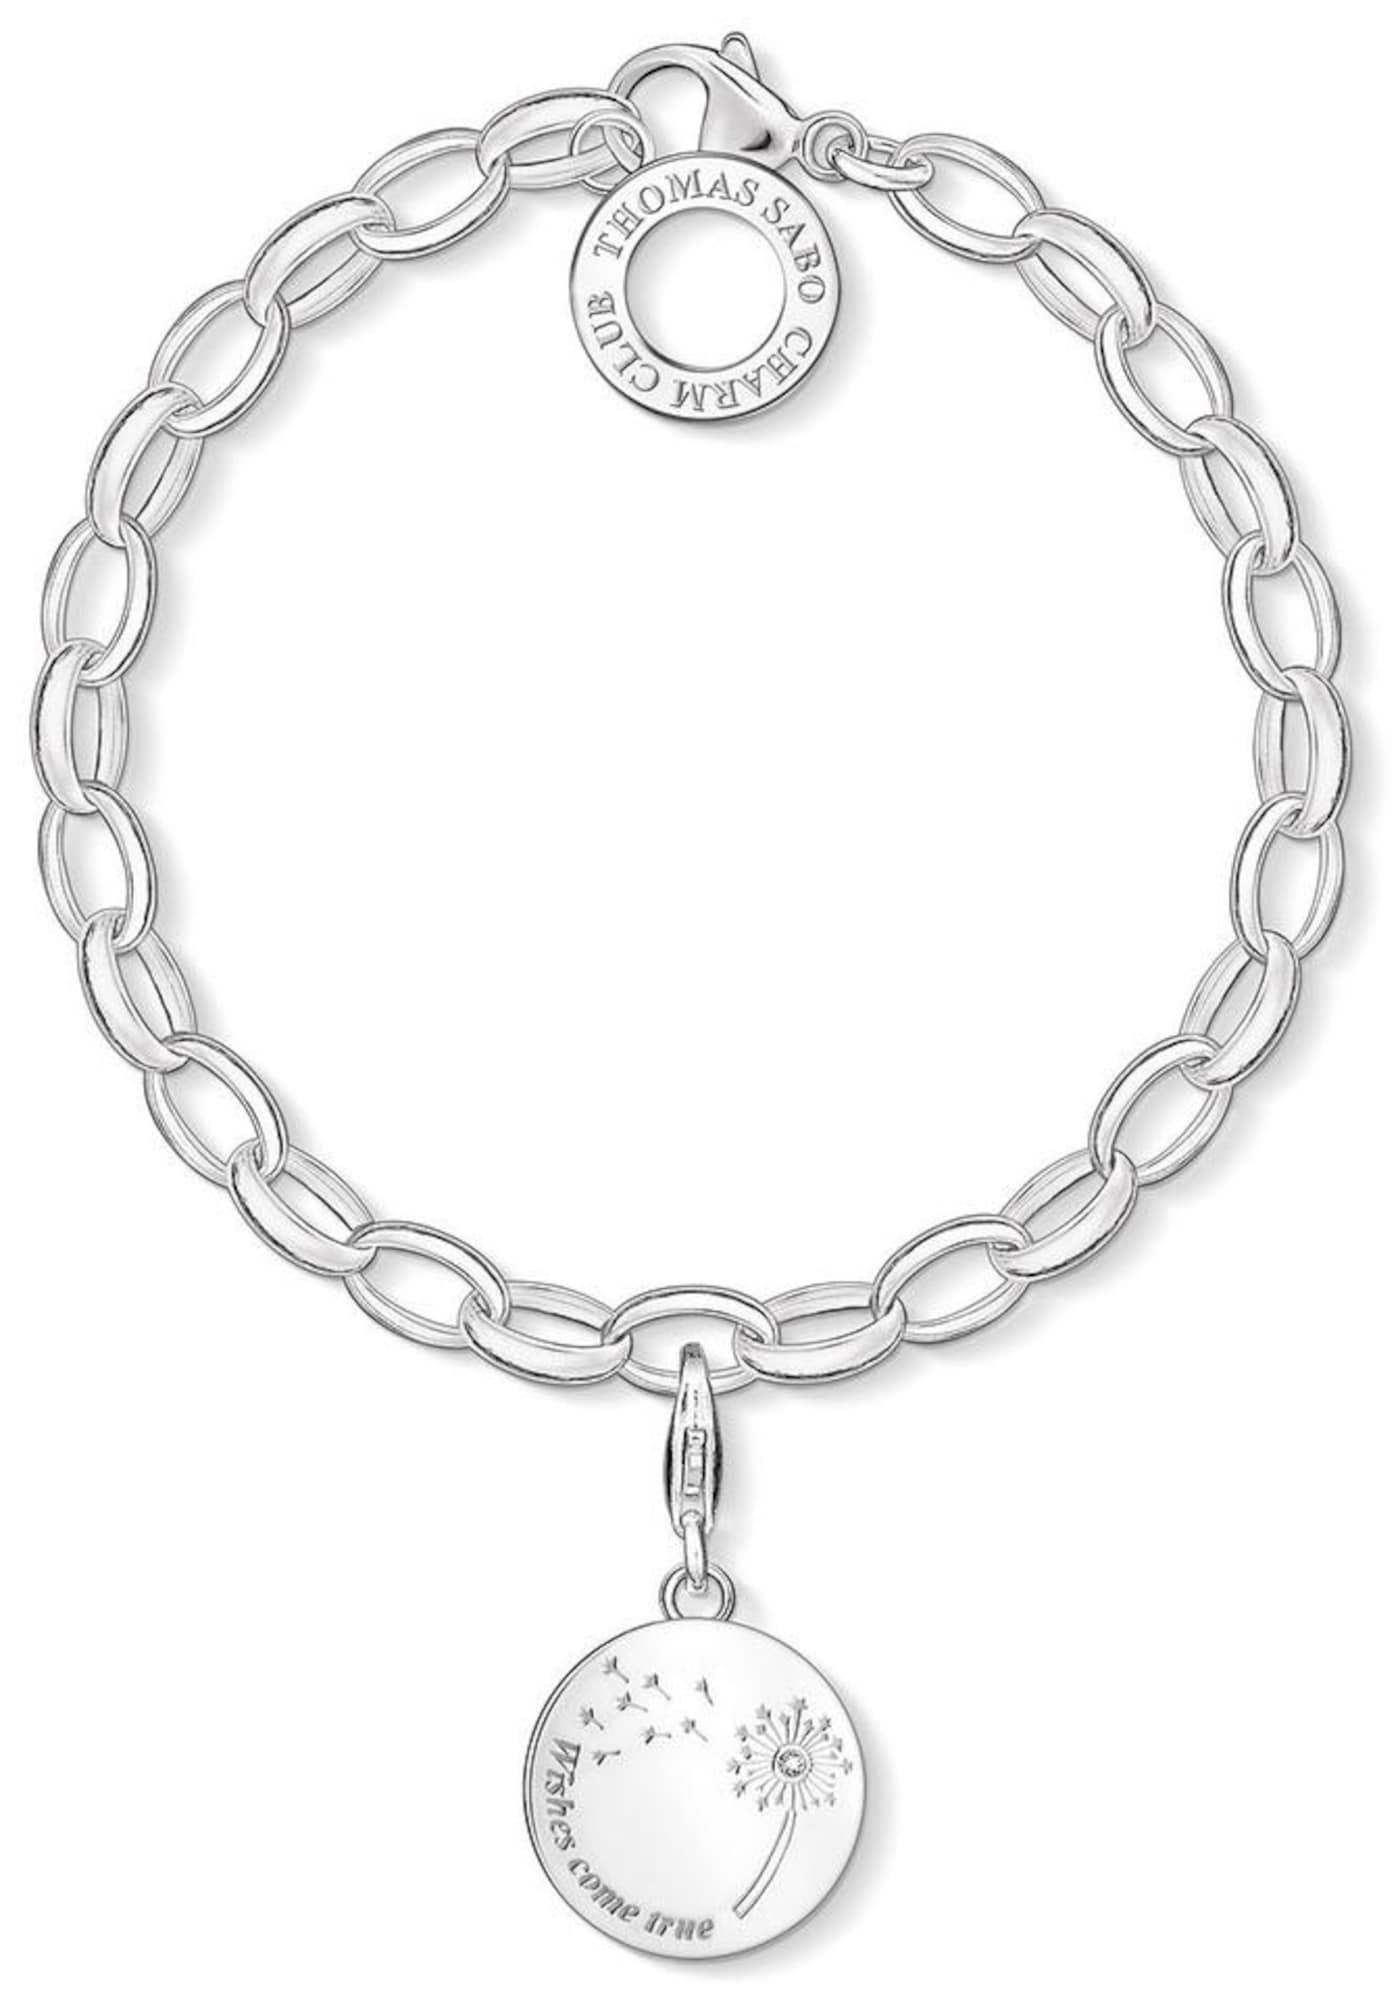 Charm-Armband Set 'Pusteblume WISHES COME TRUE, SET0336-051-14' (Set, 2 tlg.) | Schmuck > Armbänder > Charm-Armbänder | Silber - Weiß | Thomas Sabo